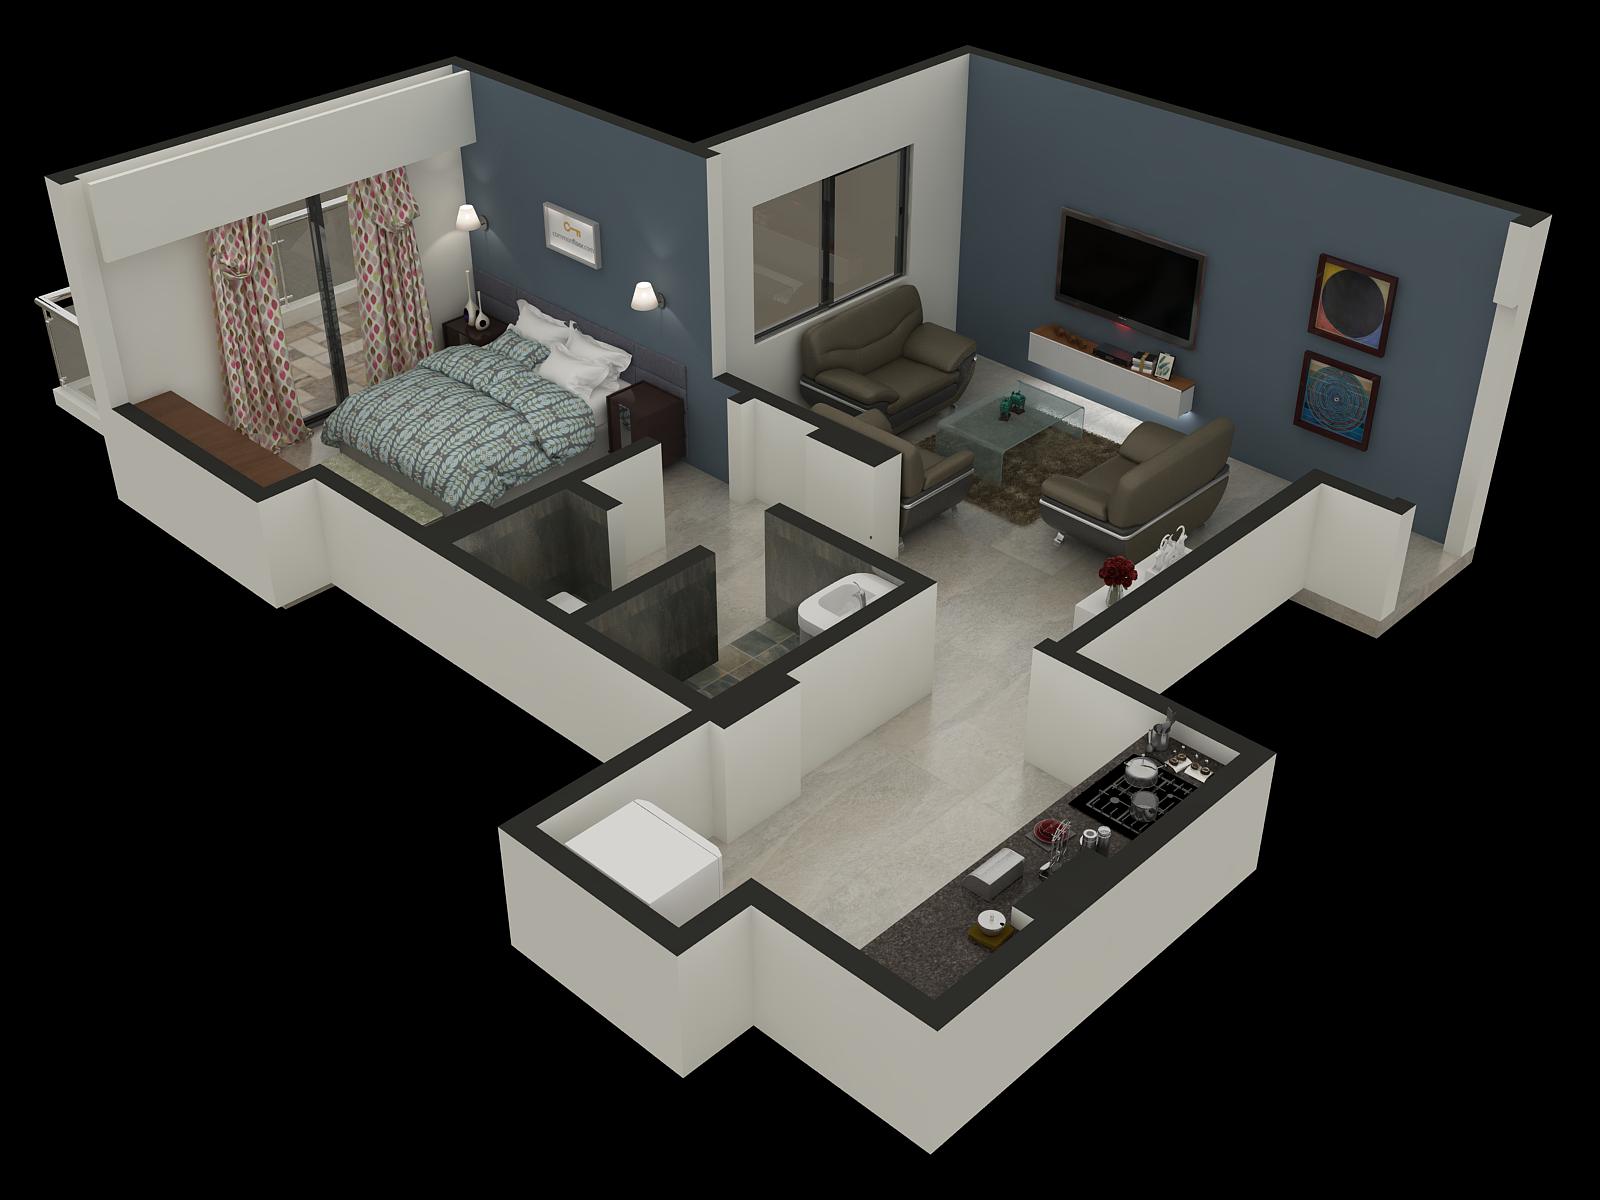 3d Floor Plan Services Architectural 3d Floor Plan Rendering Rectangle House Plans Rendered Floor Plan Sims House Design